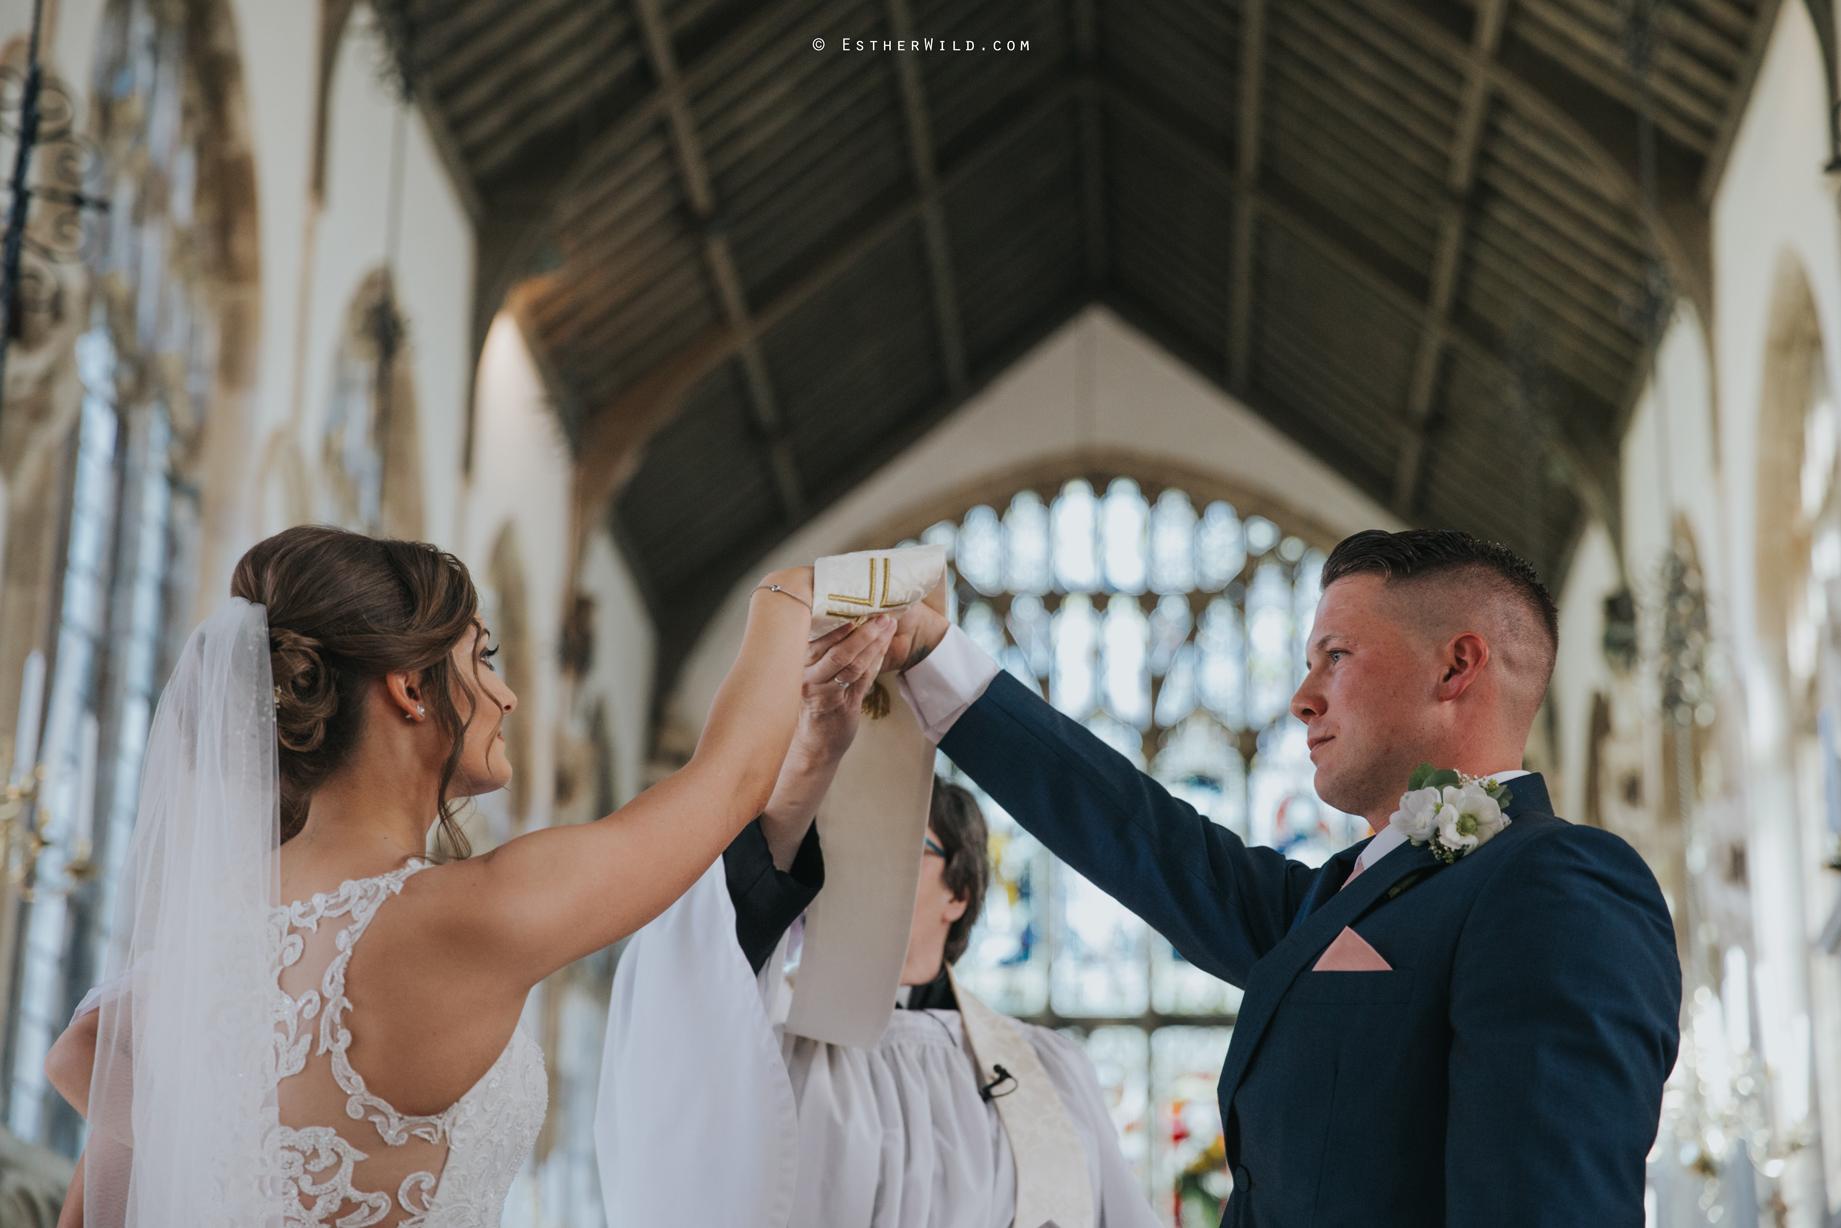 IMG_0567Walpole_St_Andrew_Church_Norfolk_Wedding_Copyright_Esther_Wild_Photographer_.jpg